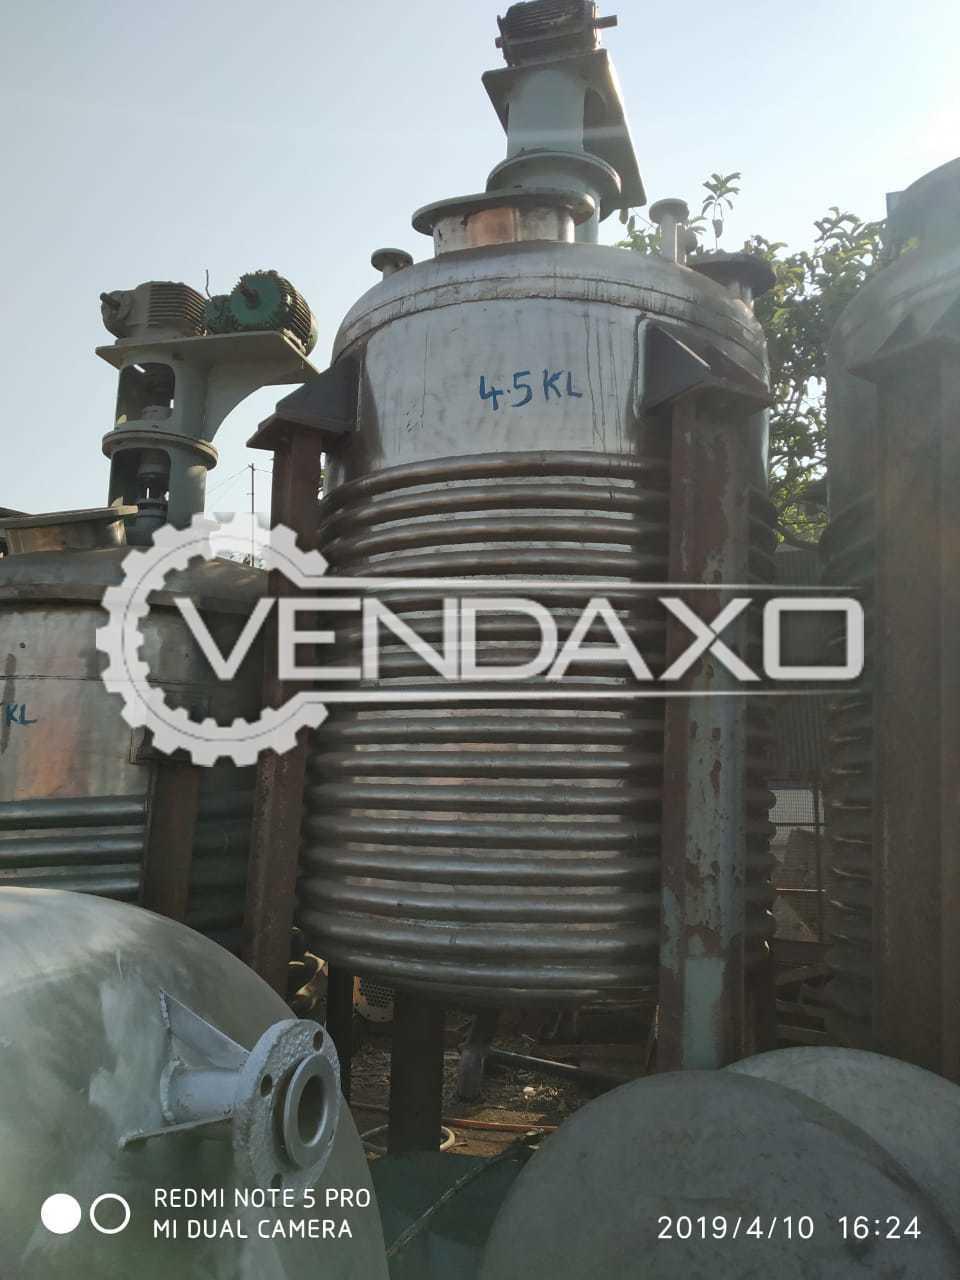 Indian Make Reactor - 4.5 KL